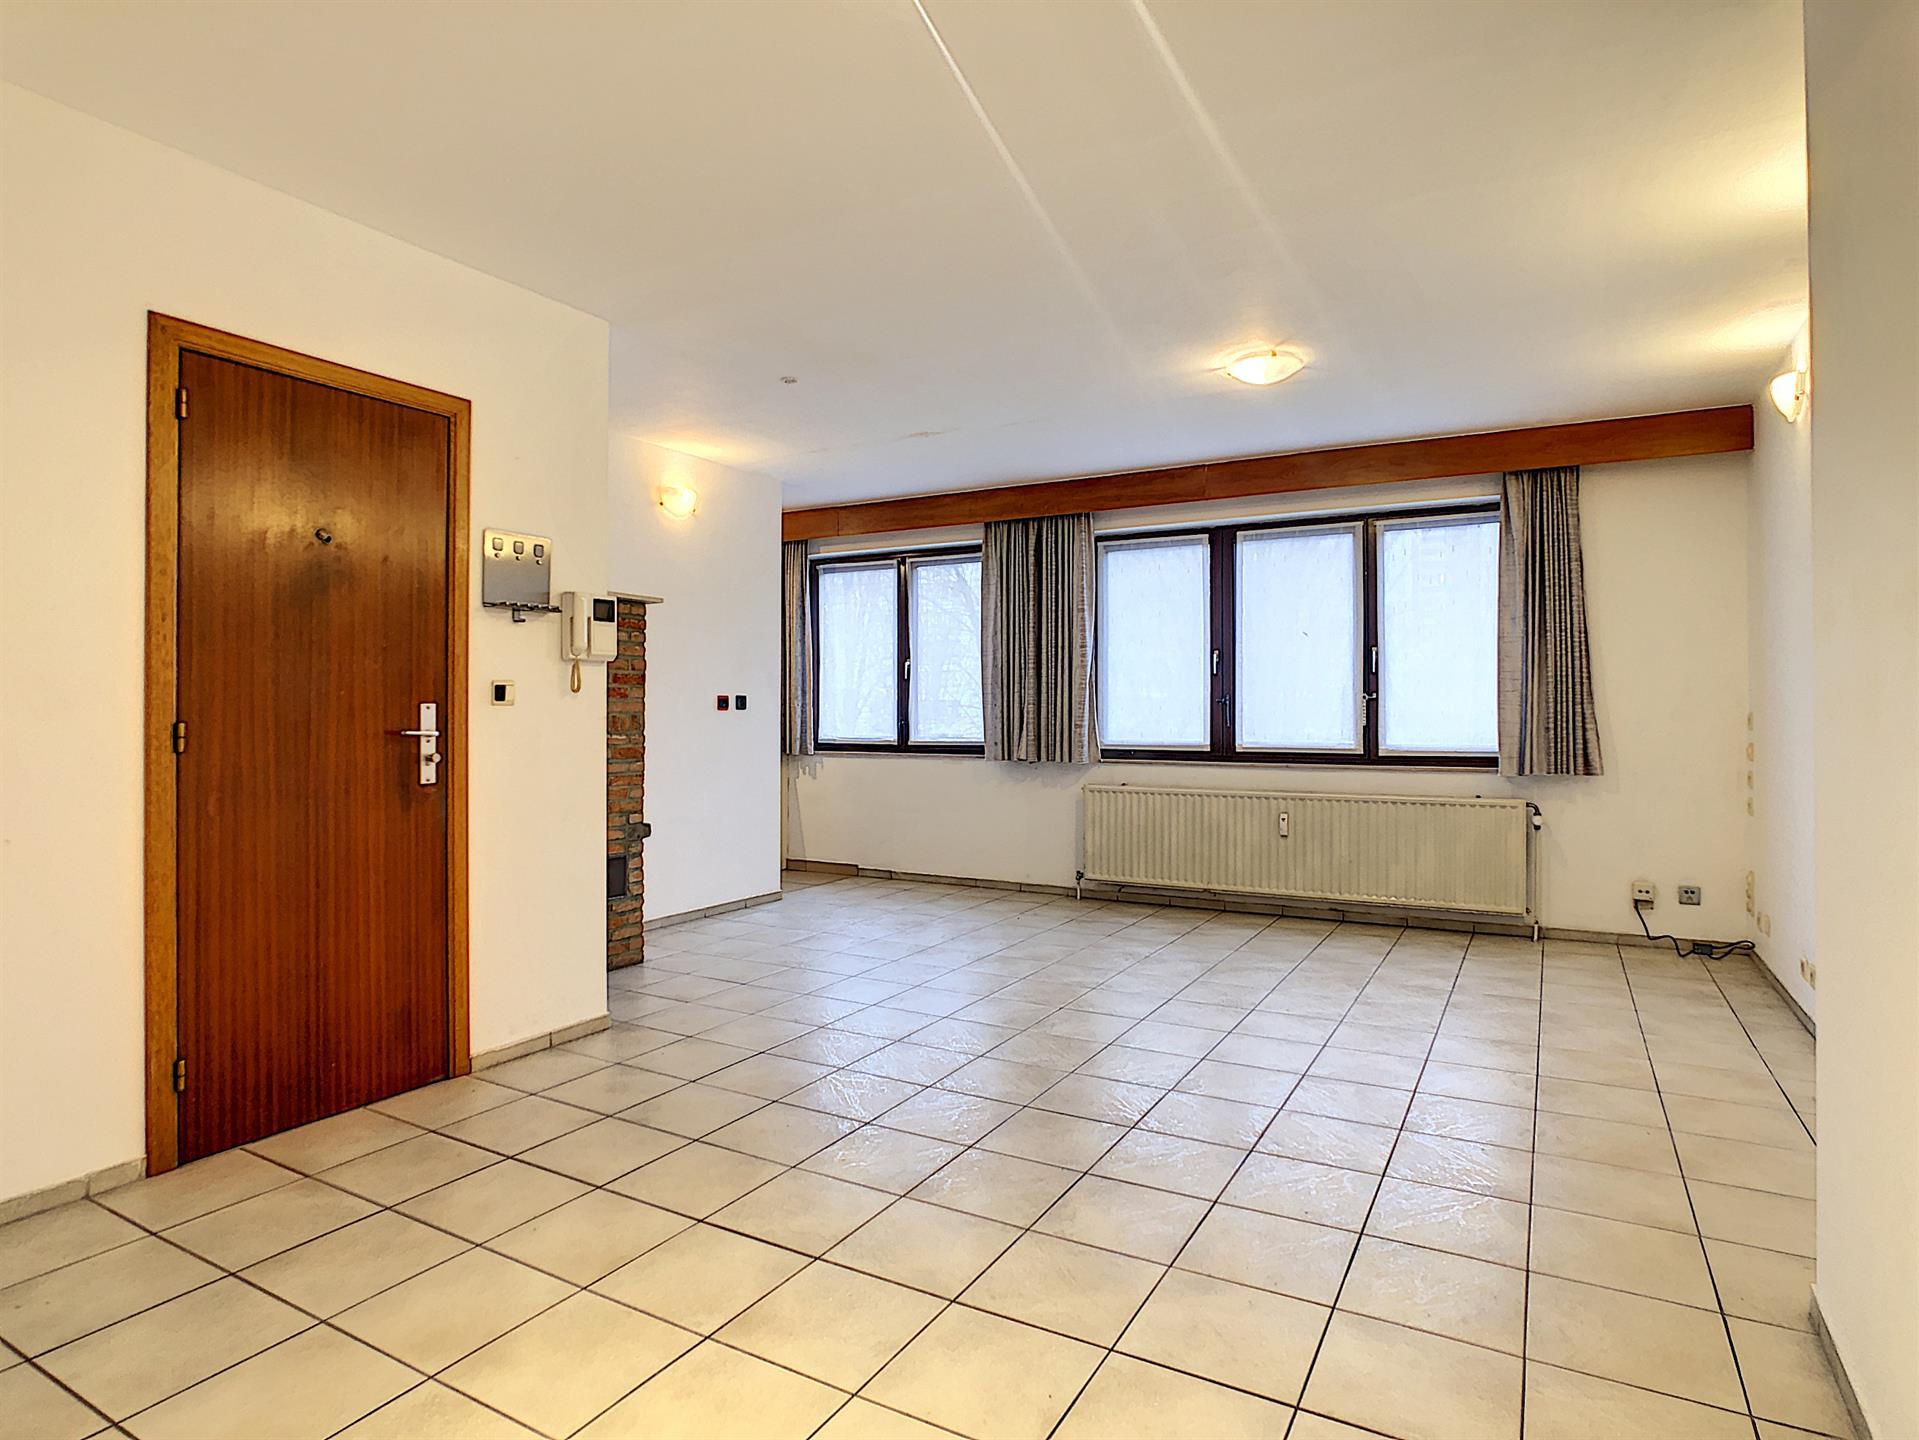 Appartement - Anderlecht - #4238875-1